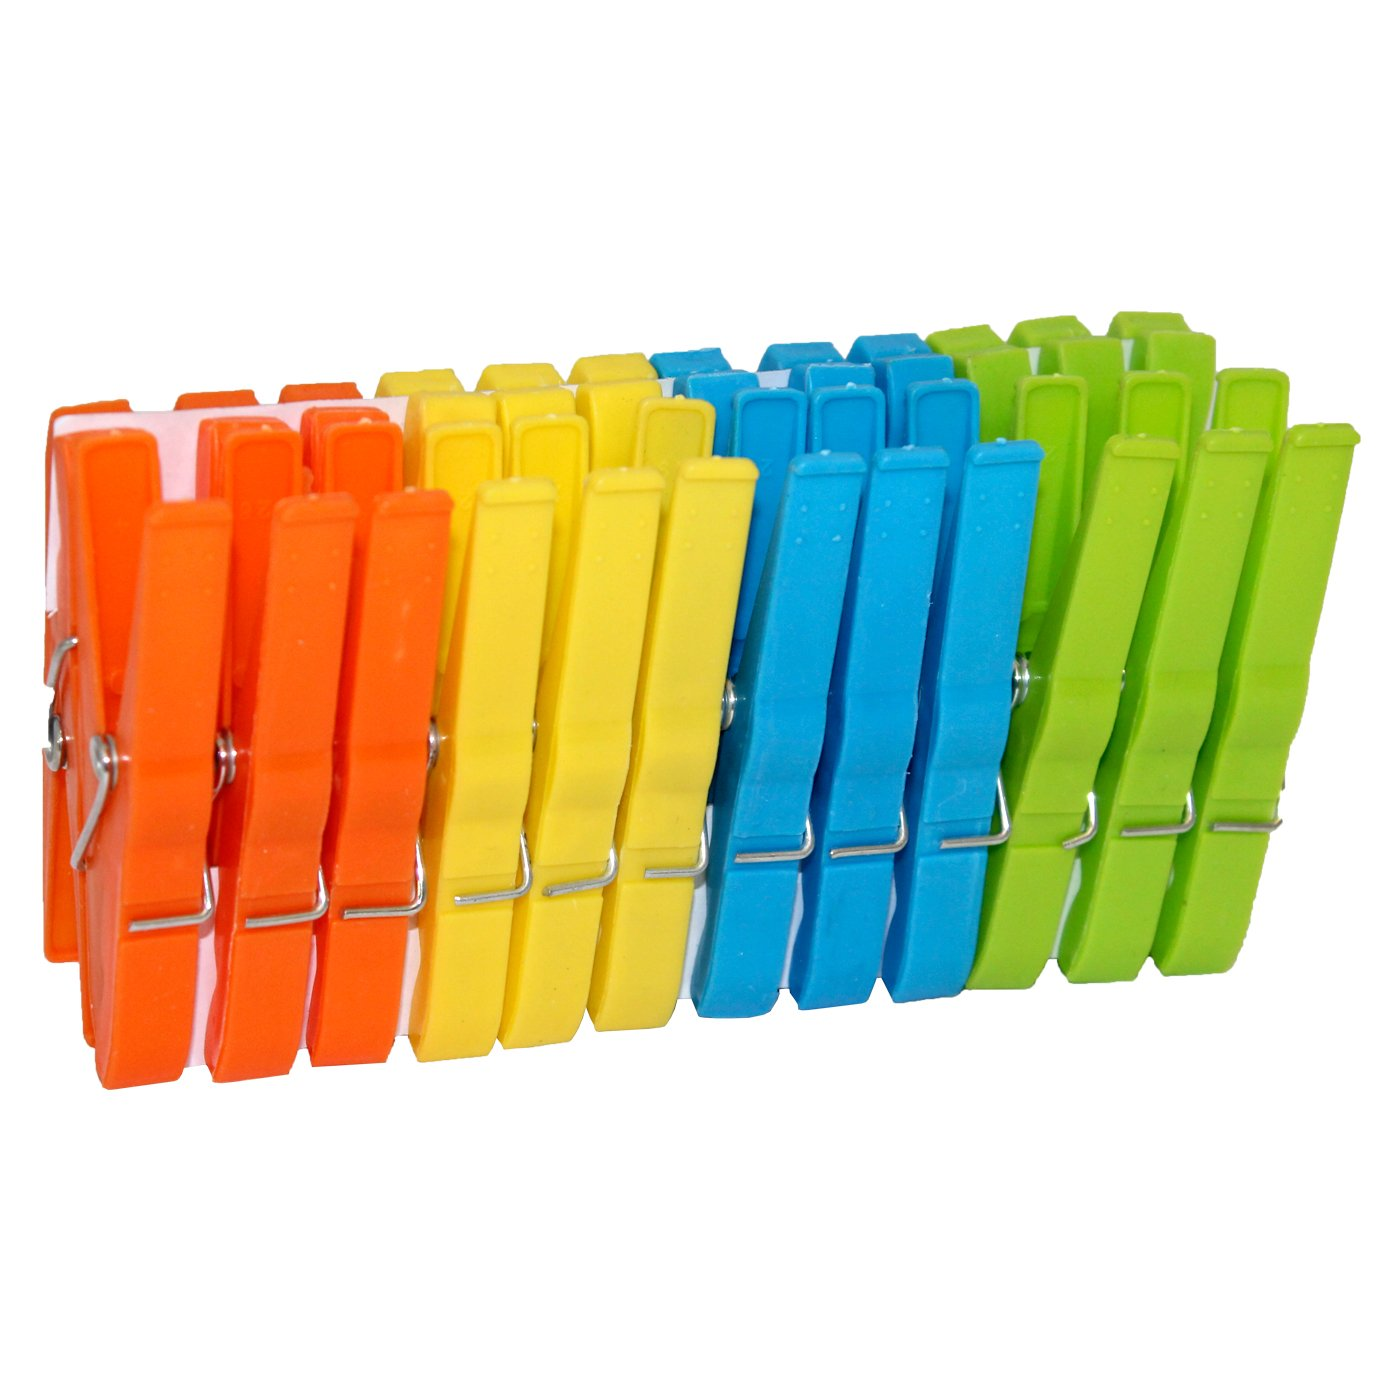 Acan 3 x Pack de 24 Pinzas de pl/ástico de 8 cm para Ropa